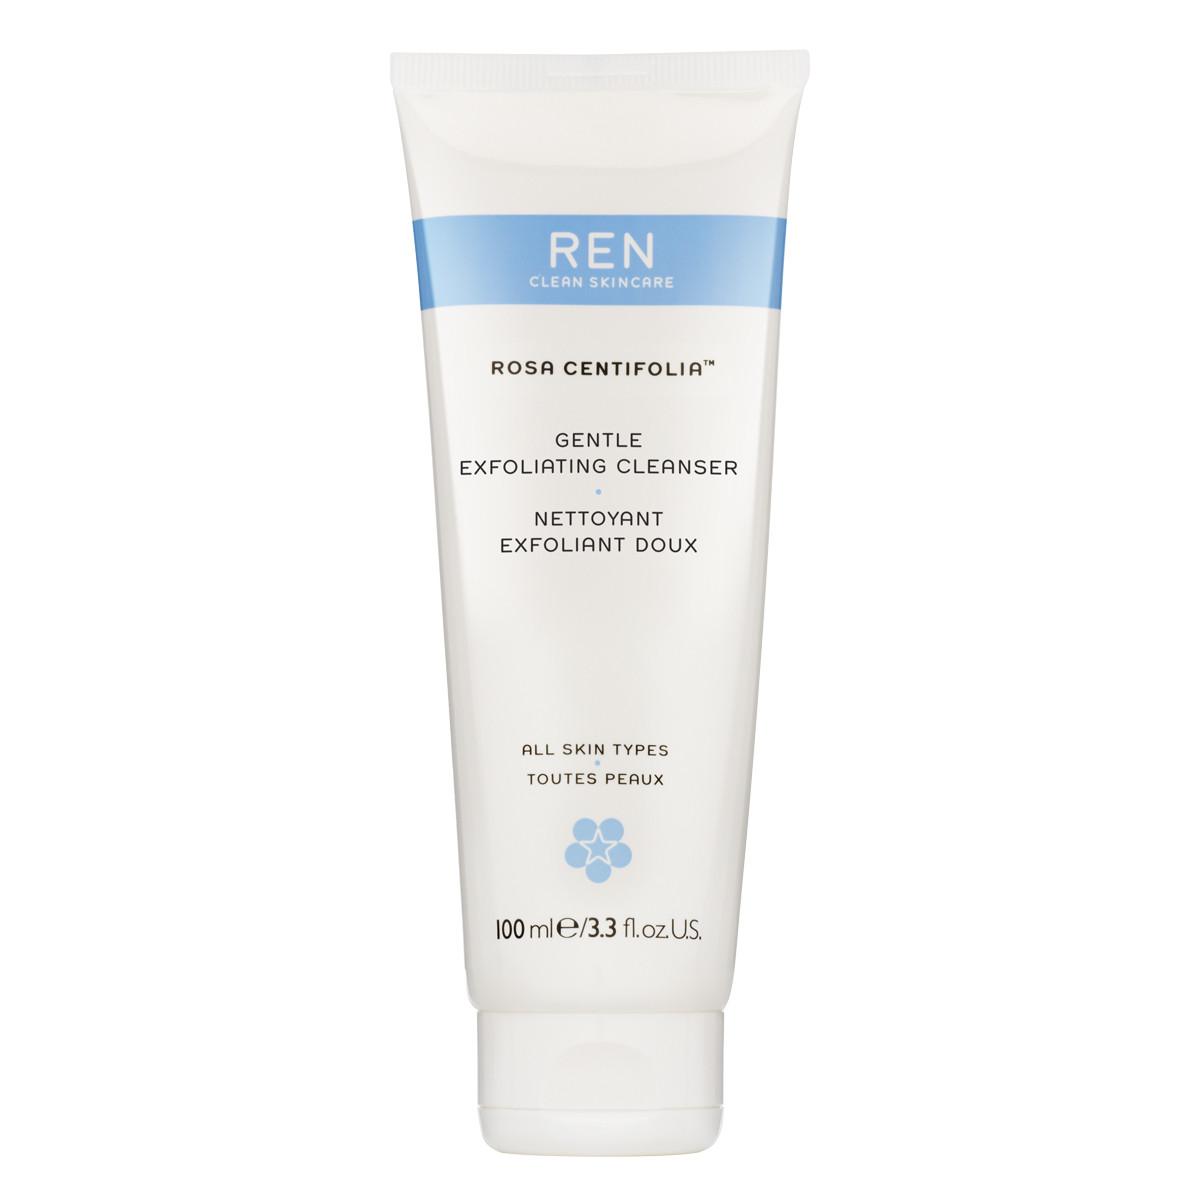 ren-clean-skincare-rosa-centifolia-gentle-exfoliating-cleanser-gesichtspeeling